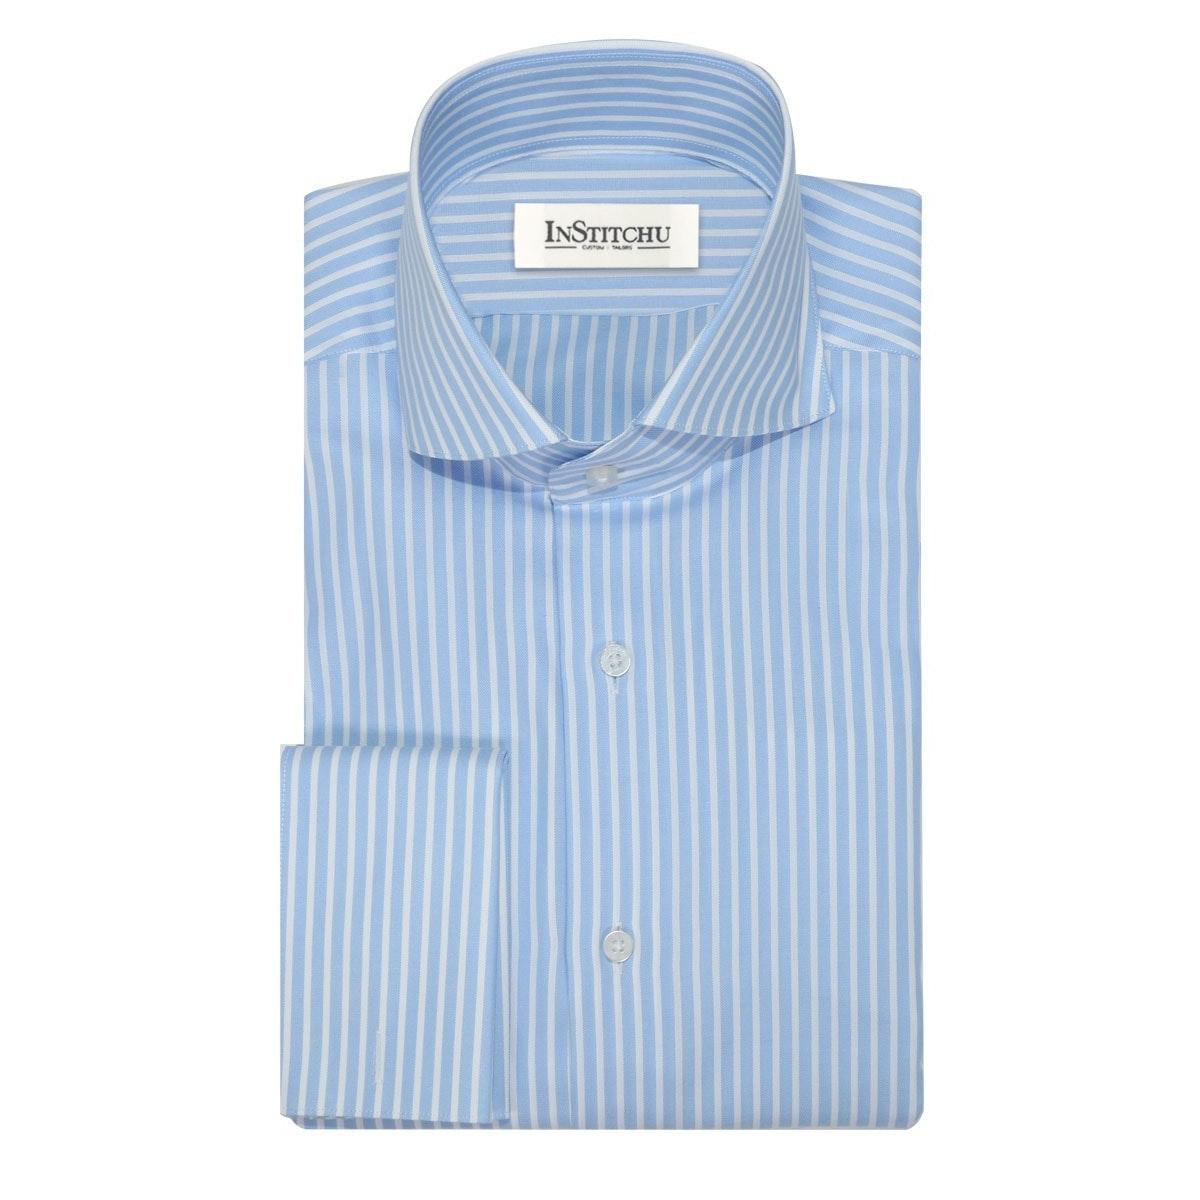 InStitchu Collection The Kewarra Blue Striped Shirt